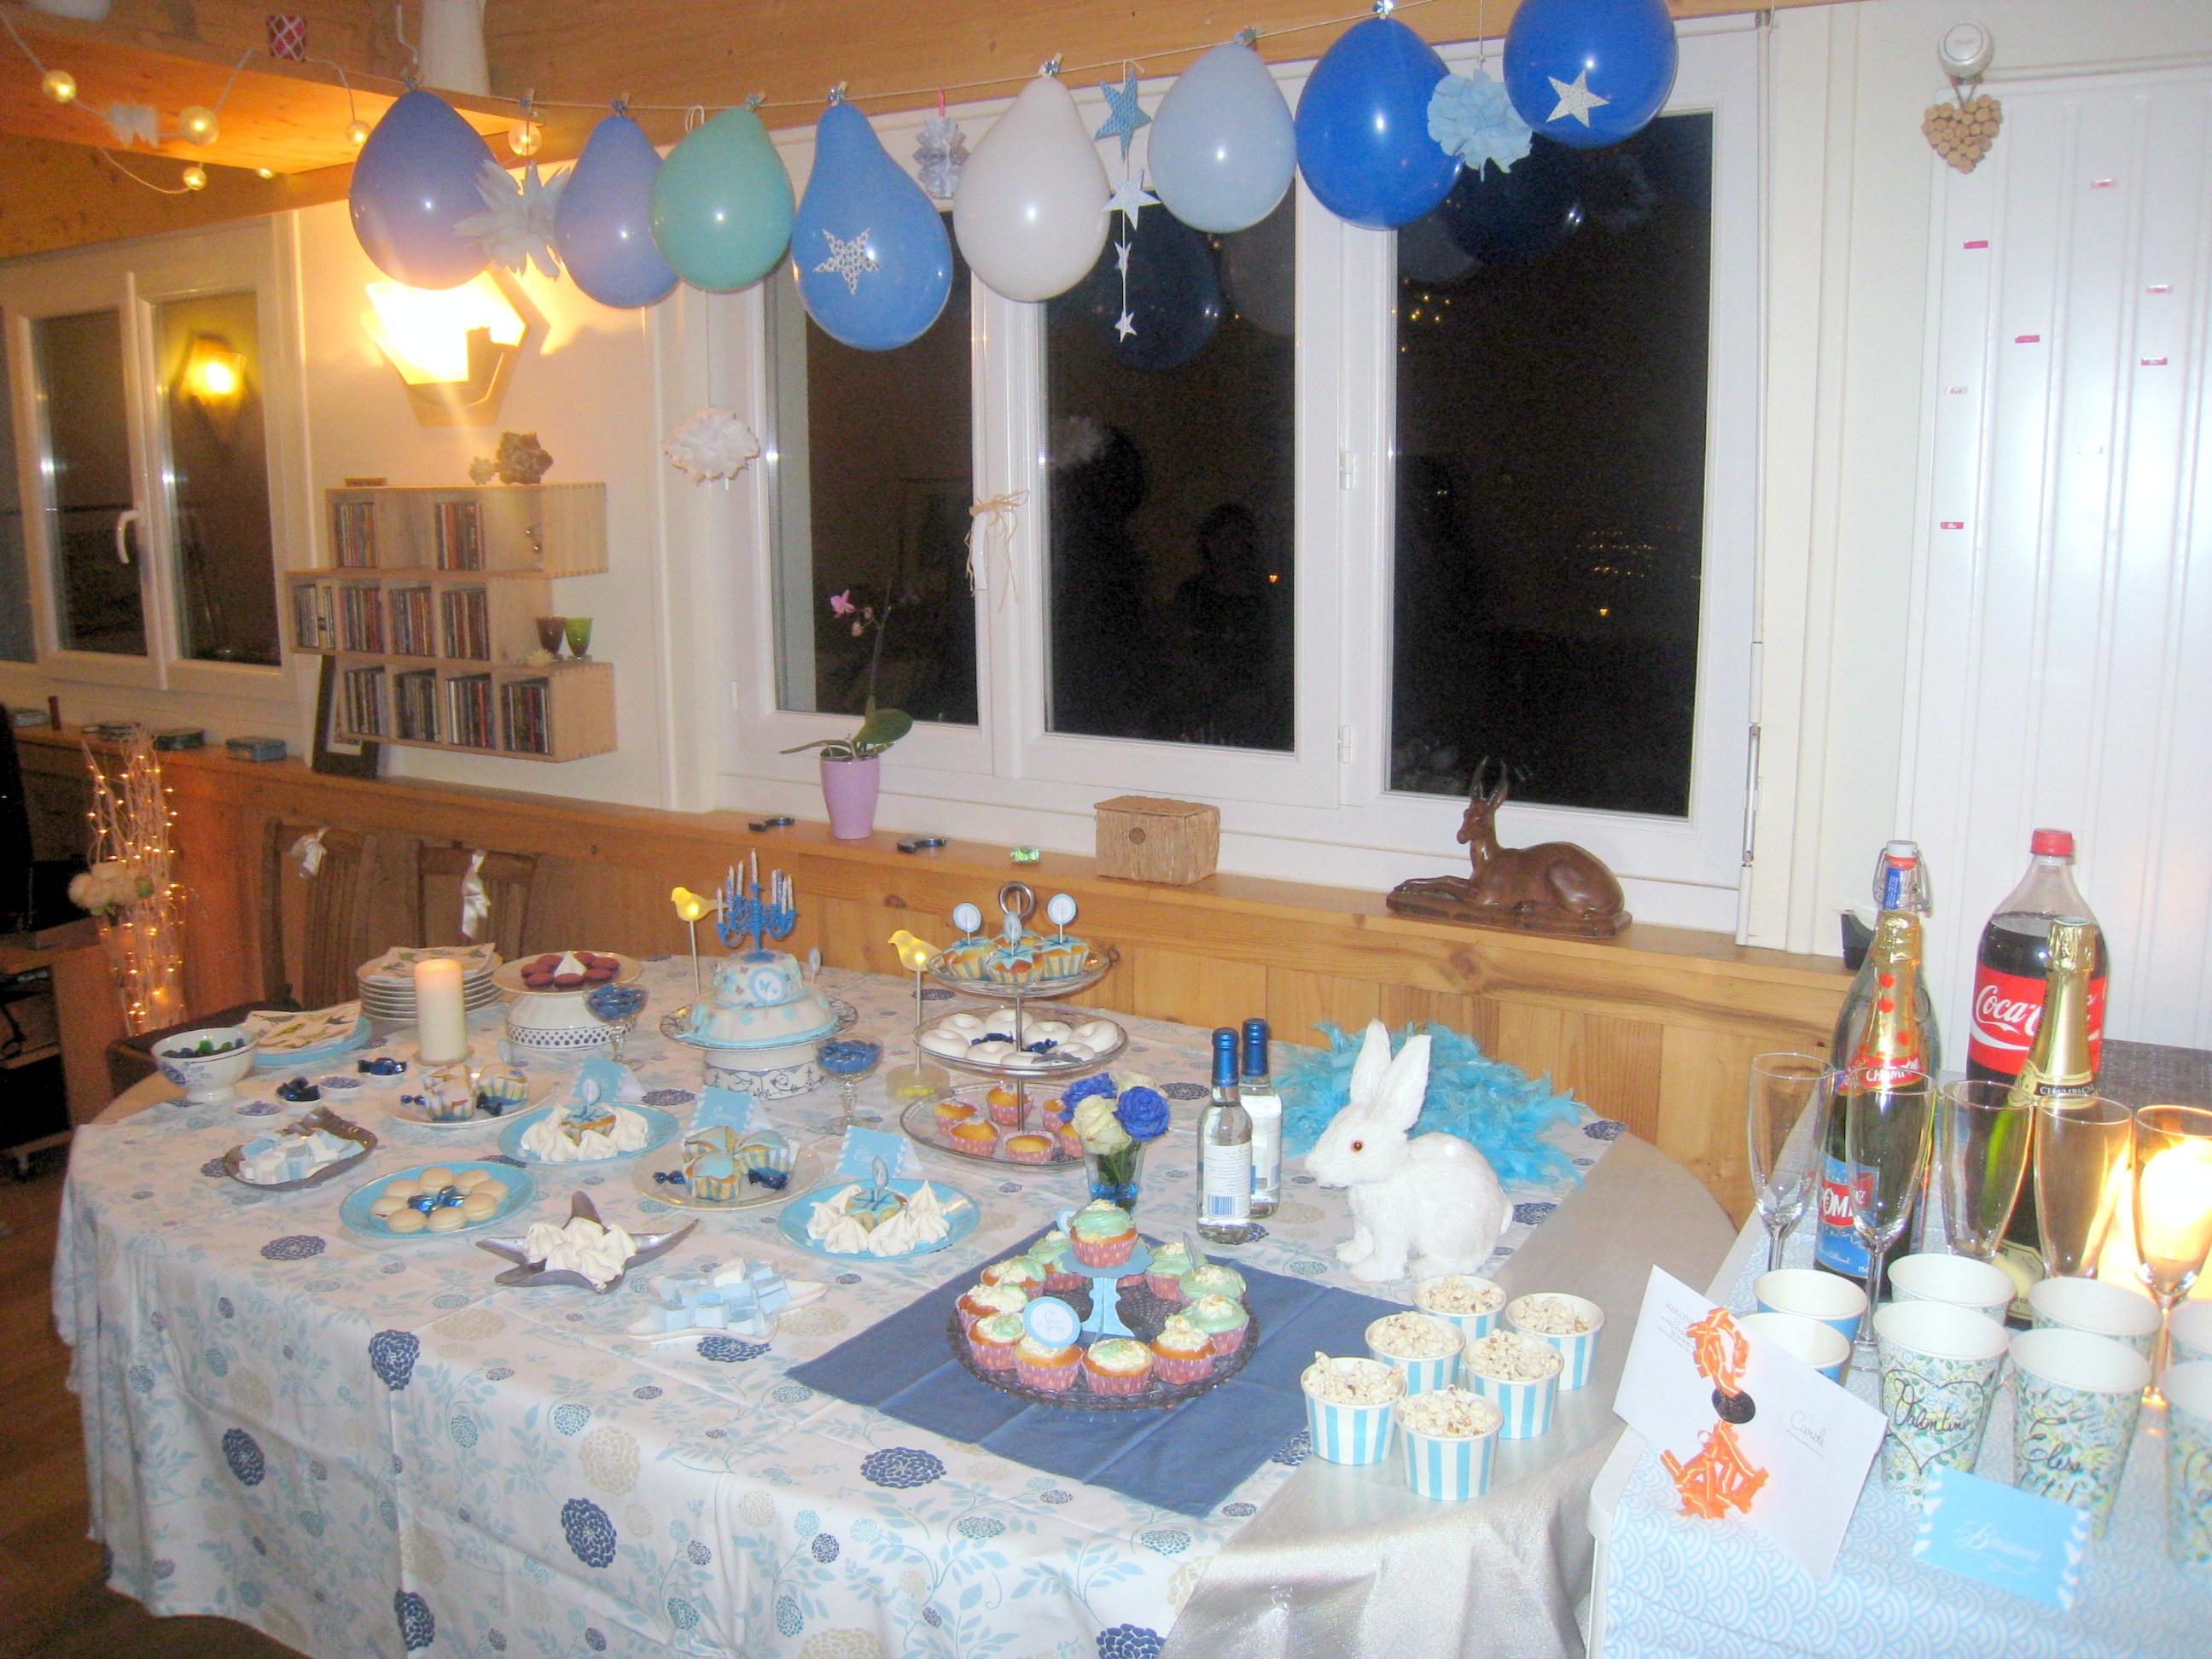 Organiser une fête #1